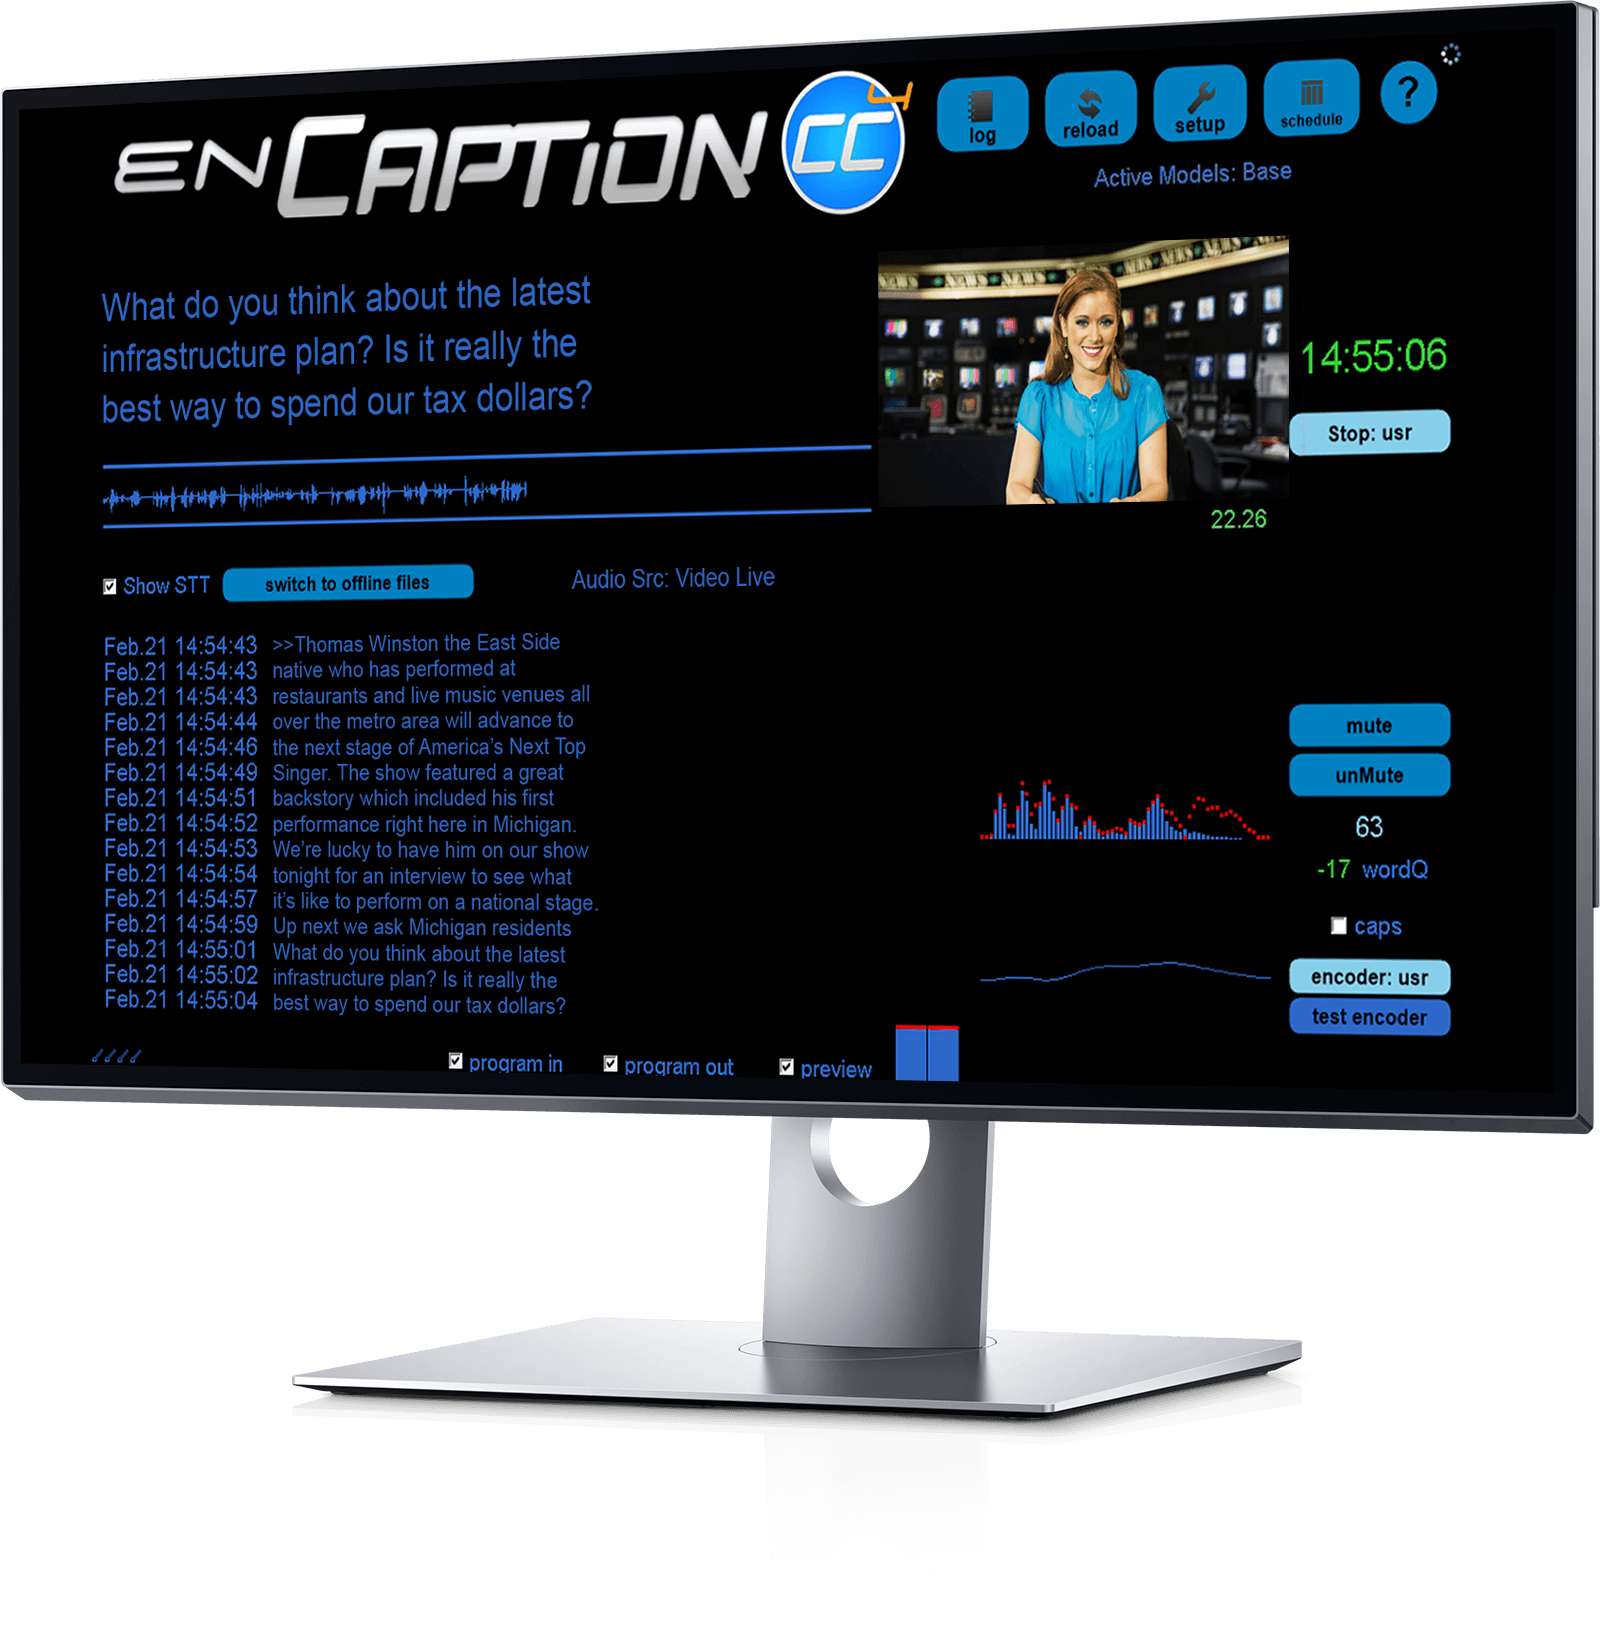 desktop example of encaption user interface